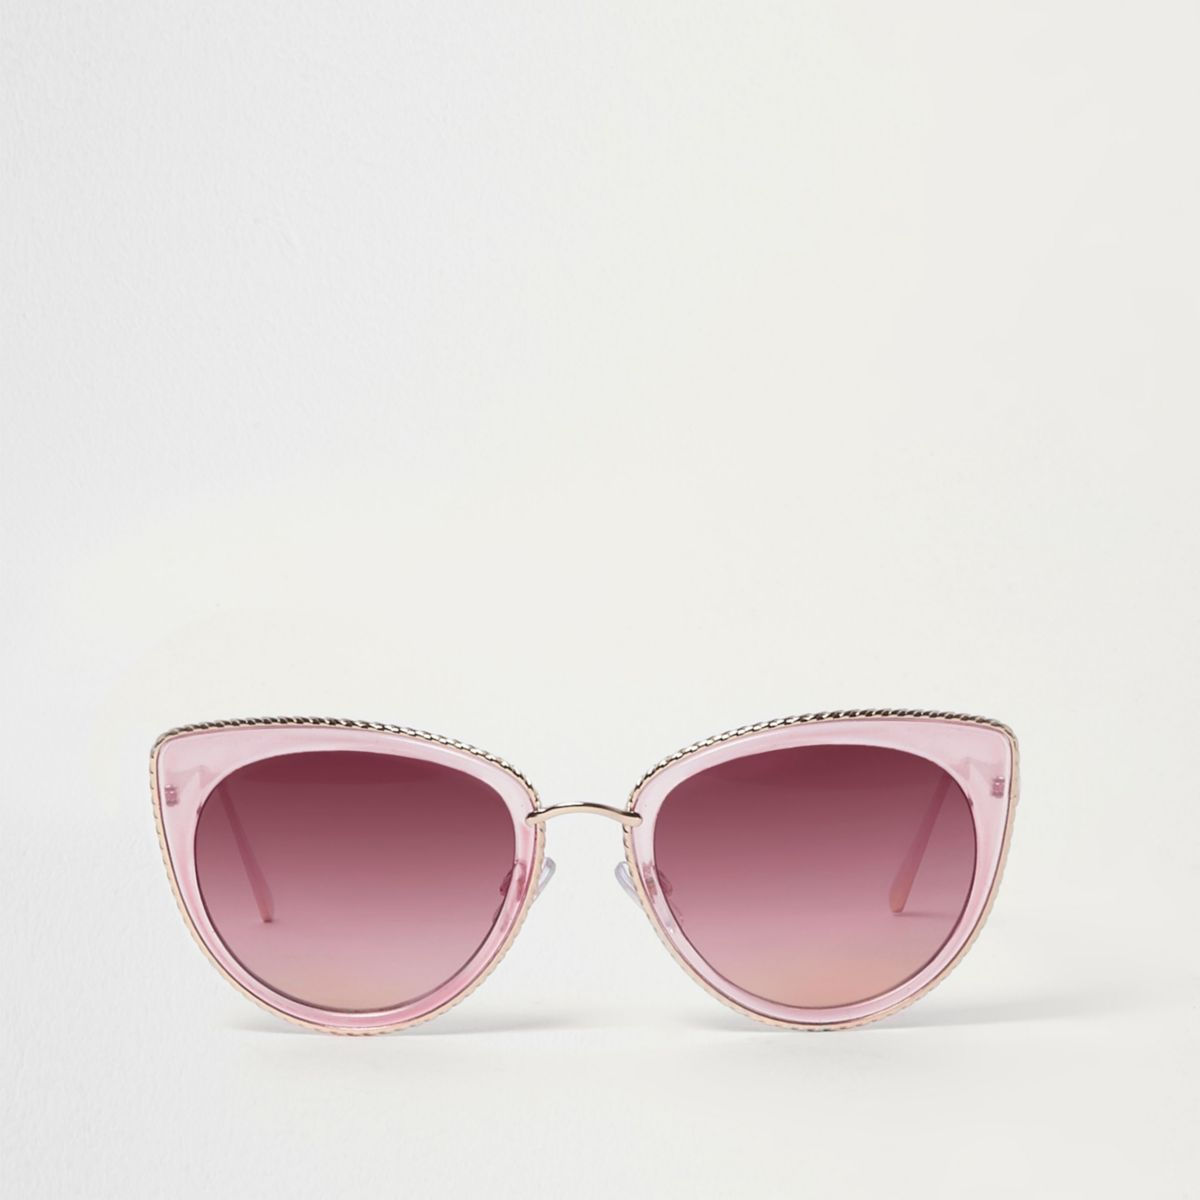 Pink cat eye gold tone trim sunglasses